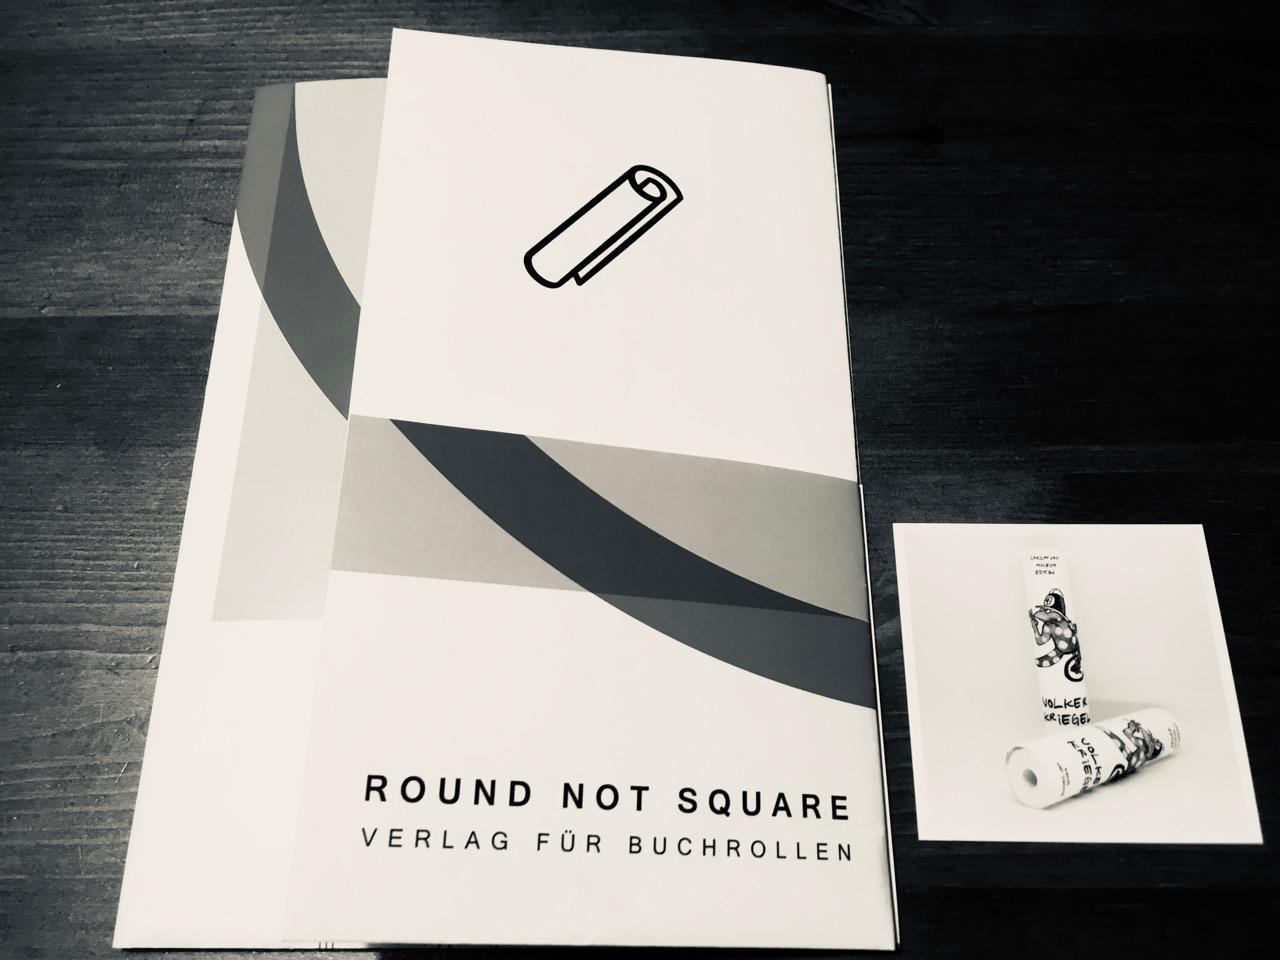 Round not Square / ベルリン発の巻物書籍